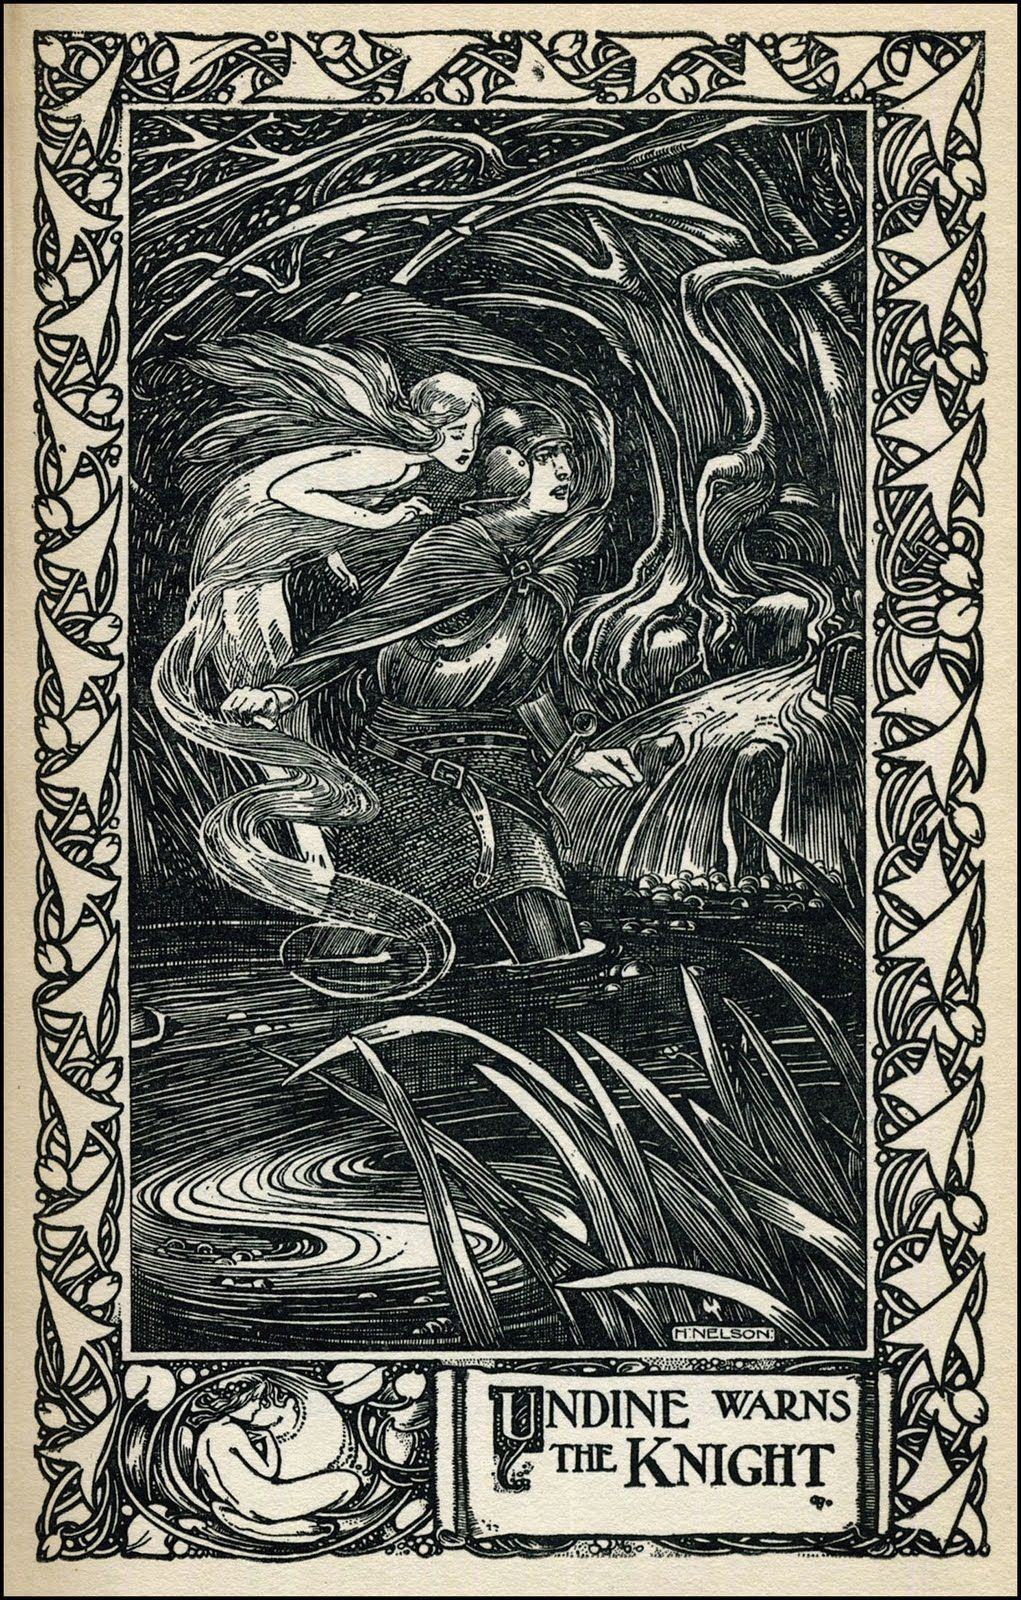 Undine And Aslauga Knight 1901 Illustrated